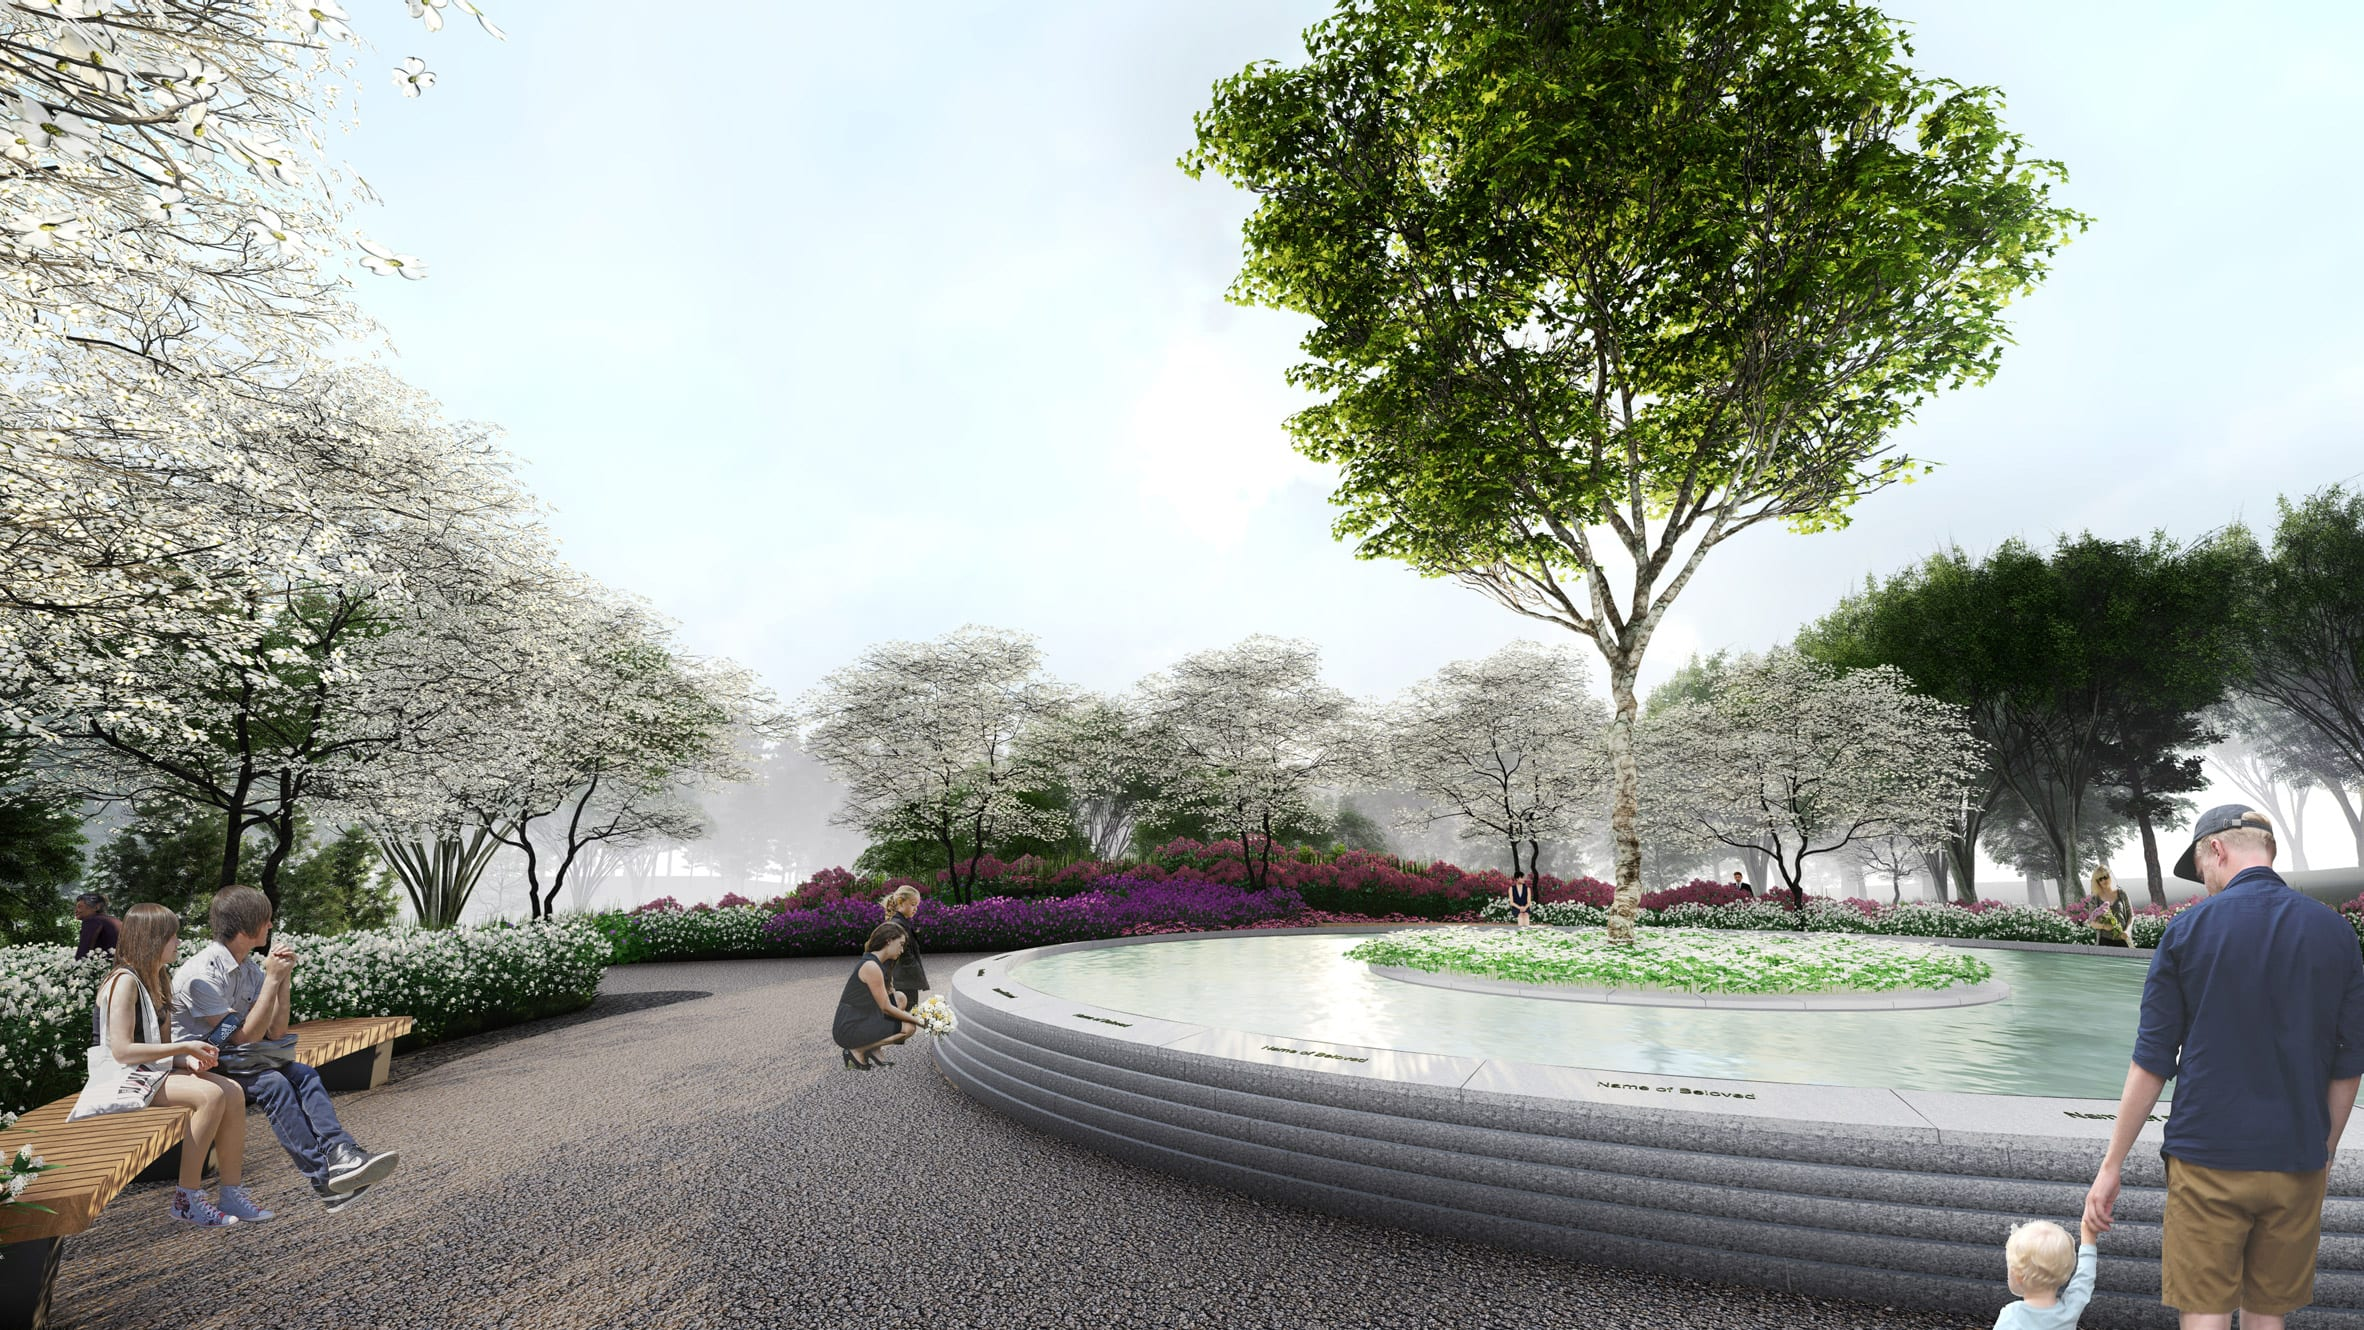 Memorial water feature